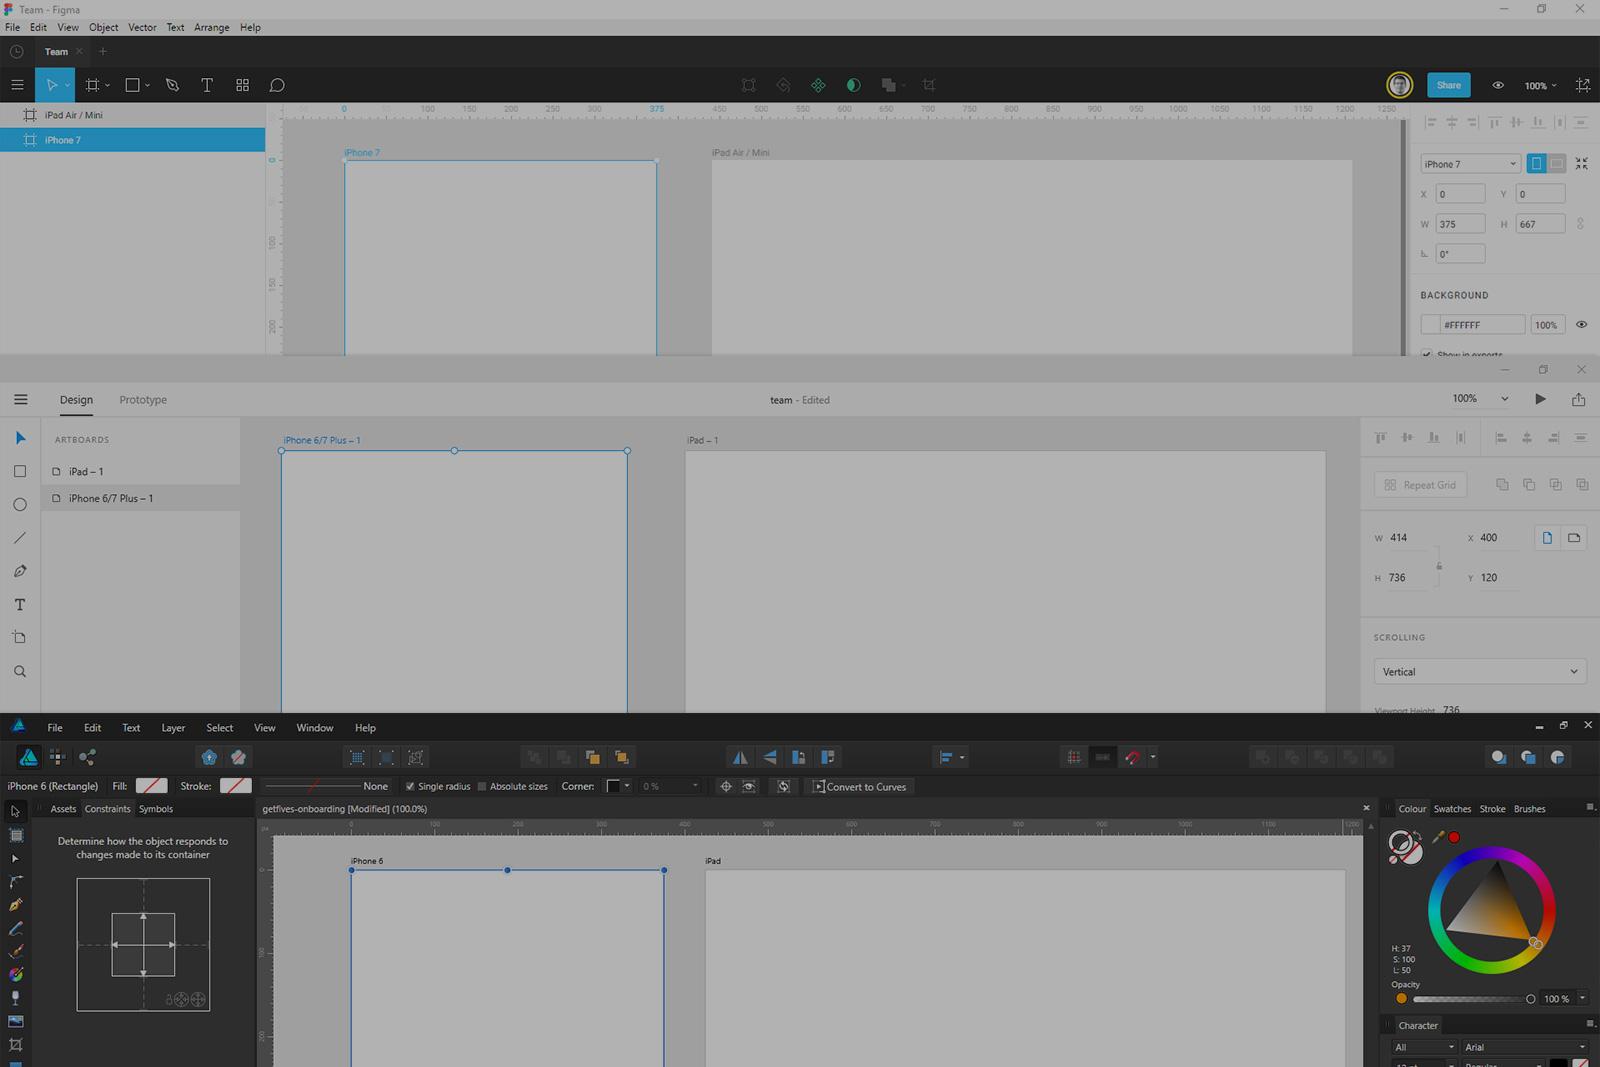 UI Design at Windows: Adobe XD, Figma, Affinity Designer - Prototyping